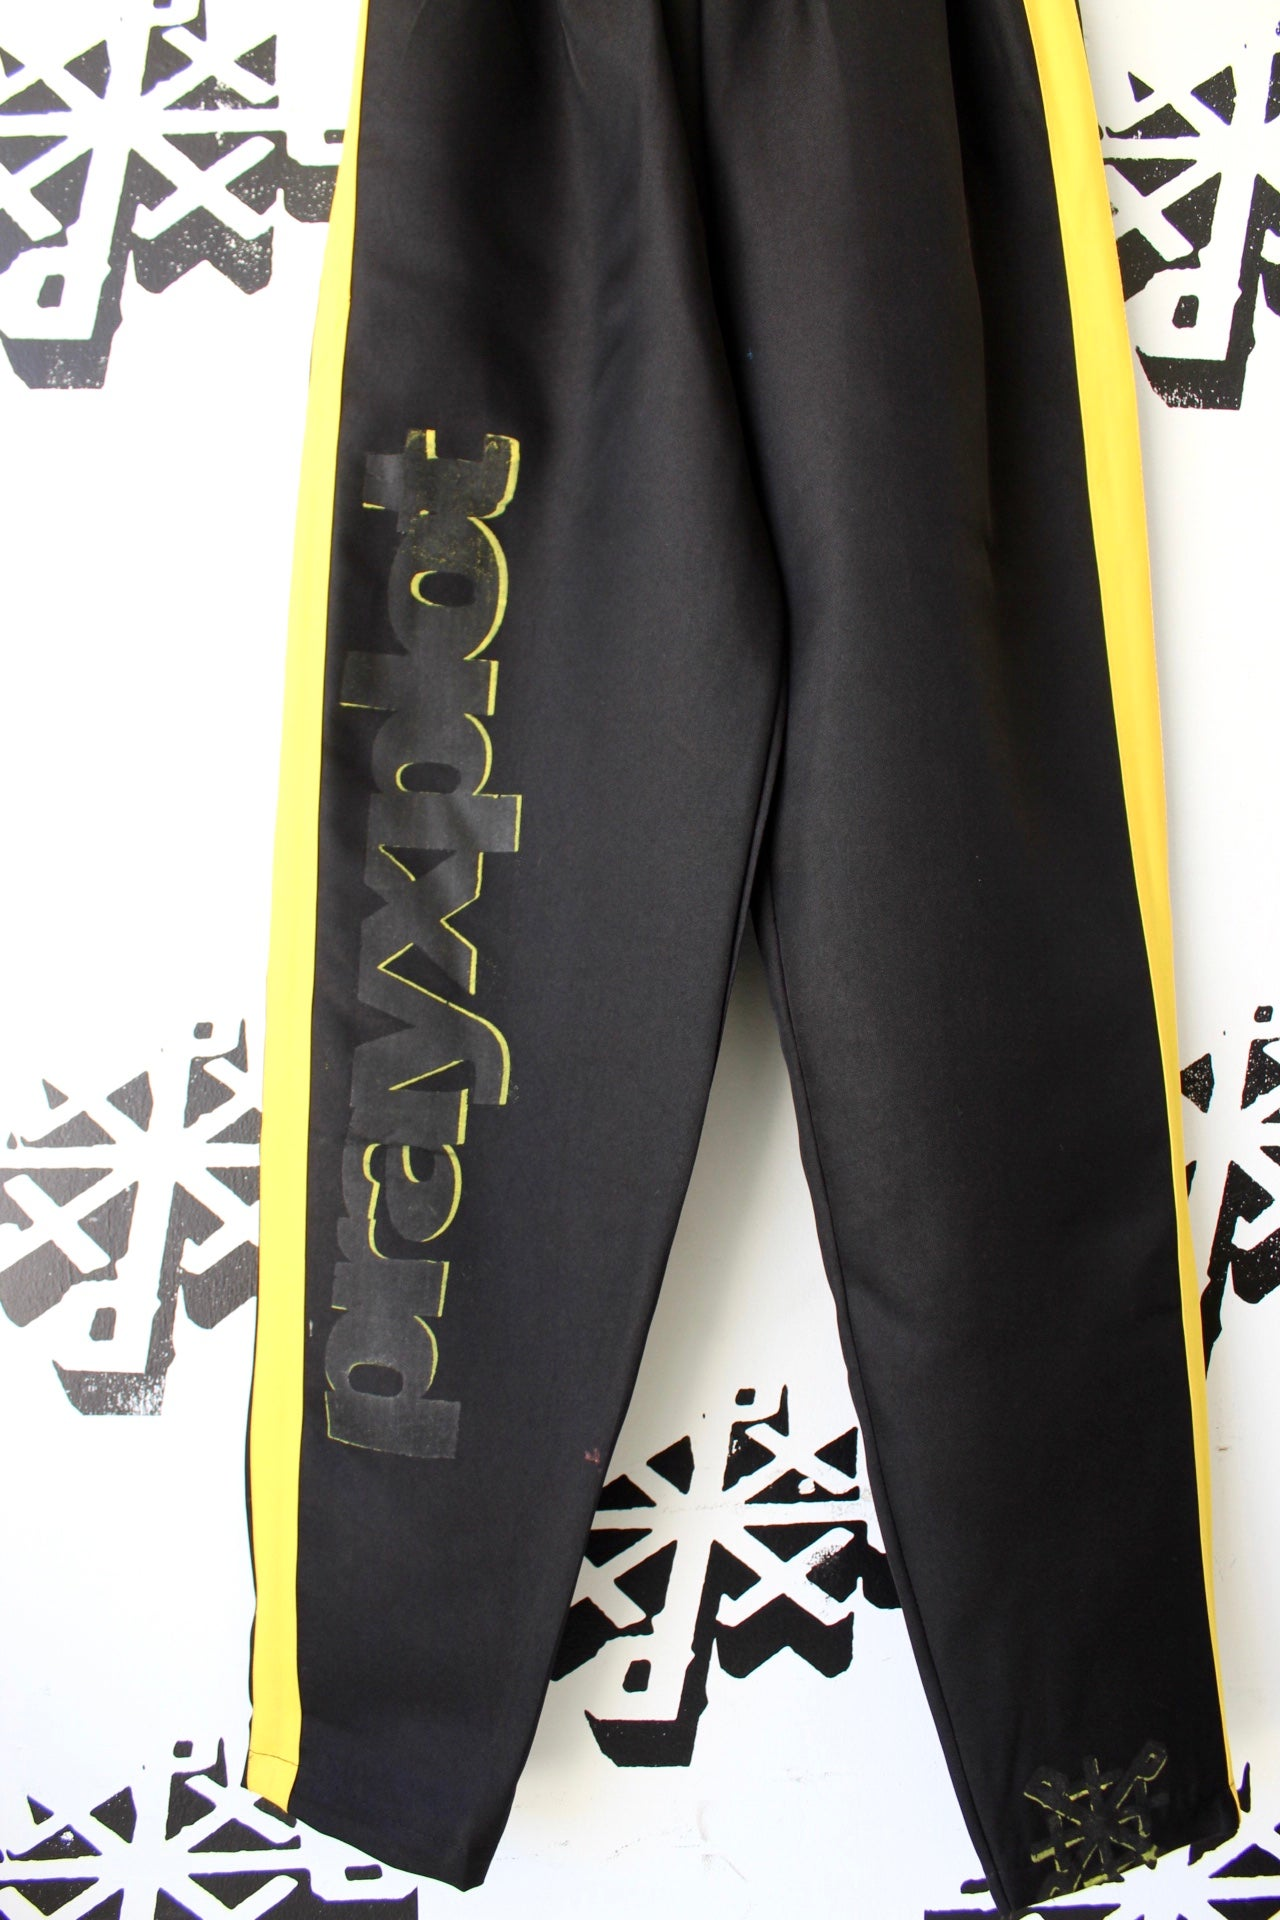 Image of 1 leg up pants in black